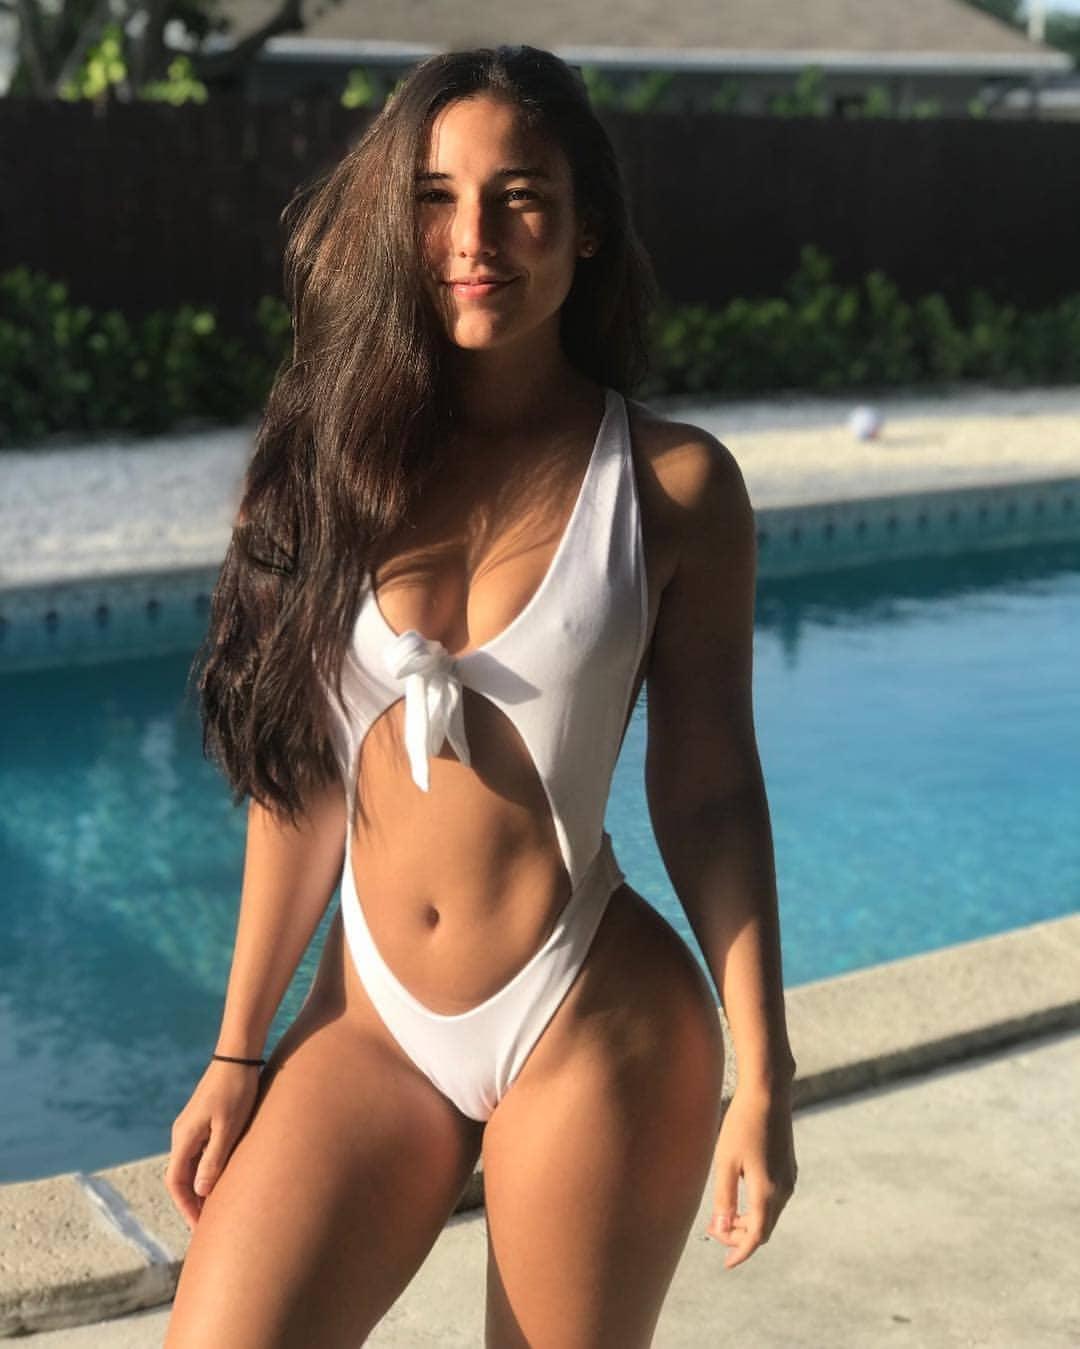 Angie Varona_scammerinfo_22